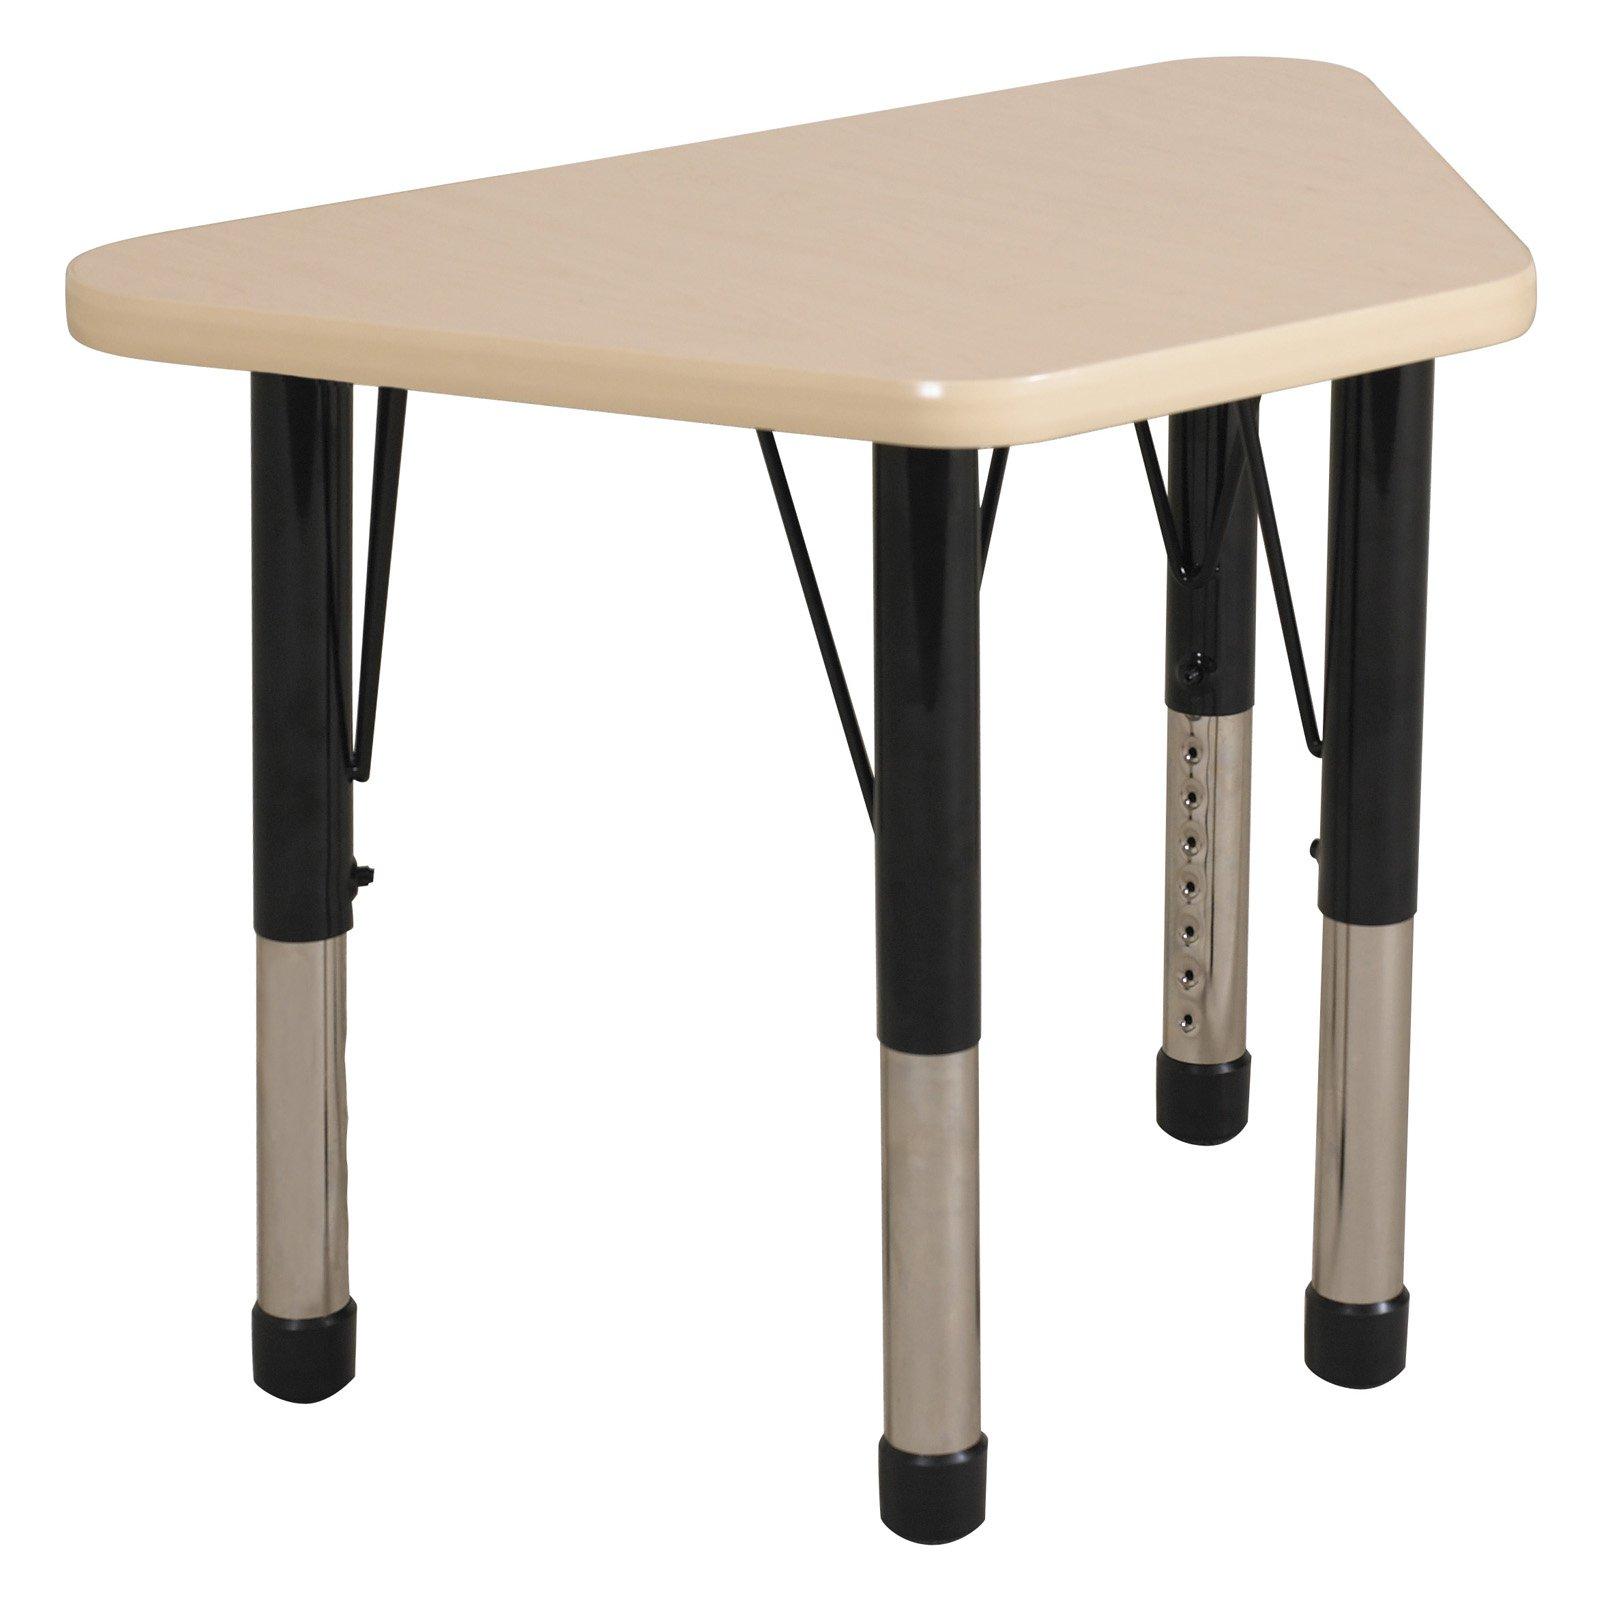 ECR4Kids 30'' x 18'' Trapezoidal Classroom Table